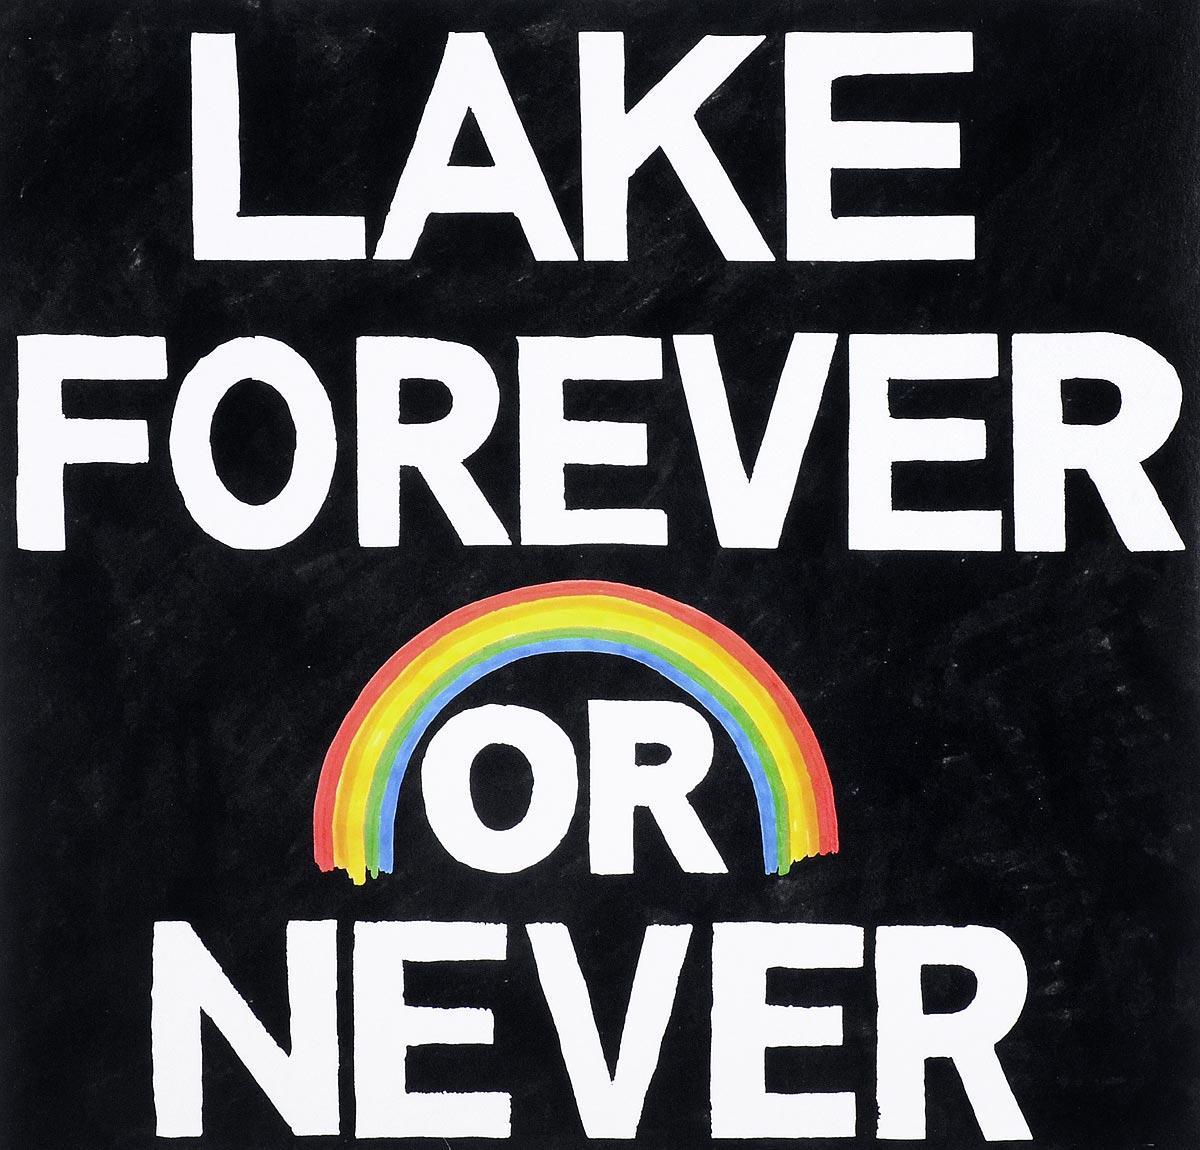 Lake. Forever Or Never (LP + CD) smal a6 hifi digital amplifier 50wx2 dac digital 110v 220v native dsd512 usb optical coaxial lp player cd analog input